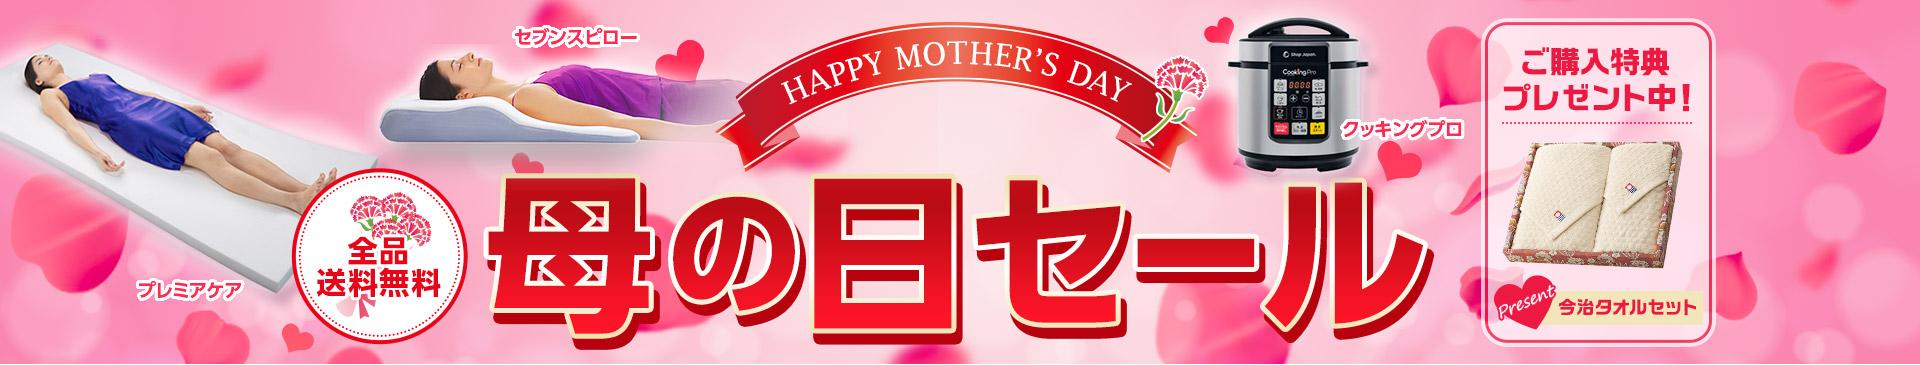 HAPPY MOTHER'S DAY 全品送料無料 母の日セール ご購入特典プレゼント中! Present 今治タオルセット